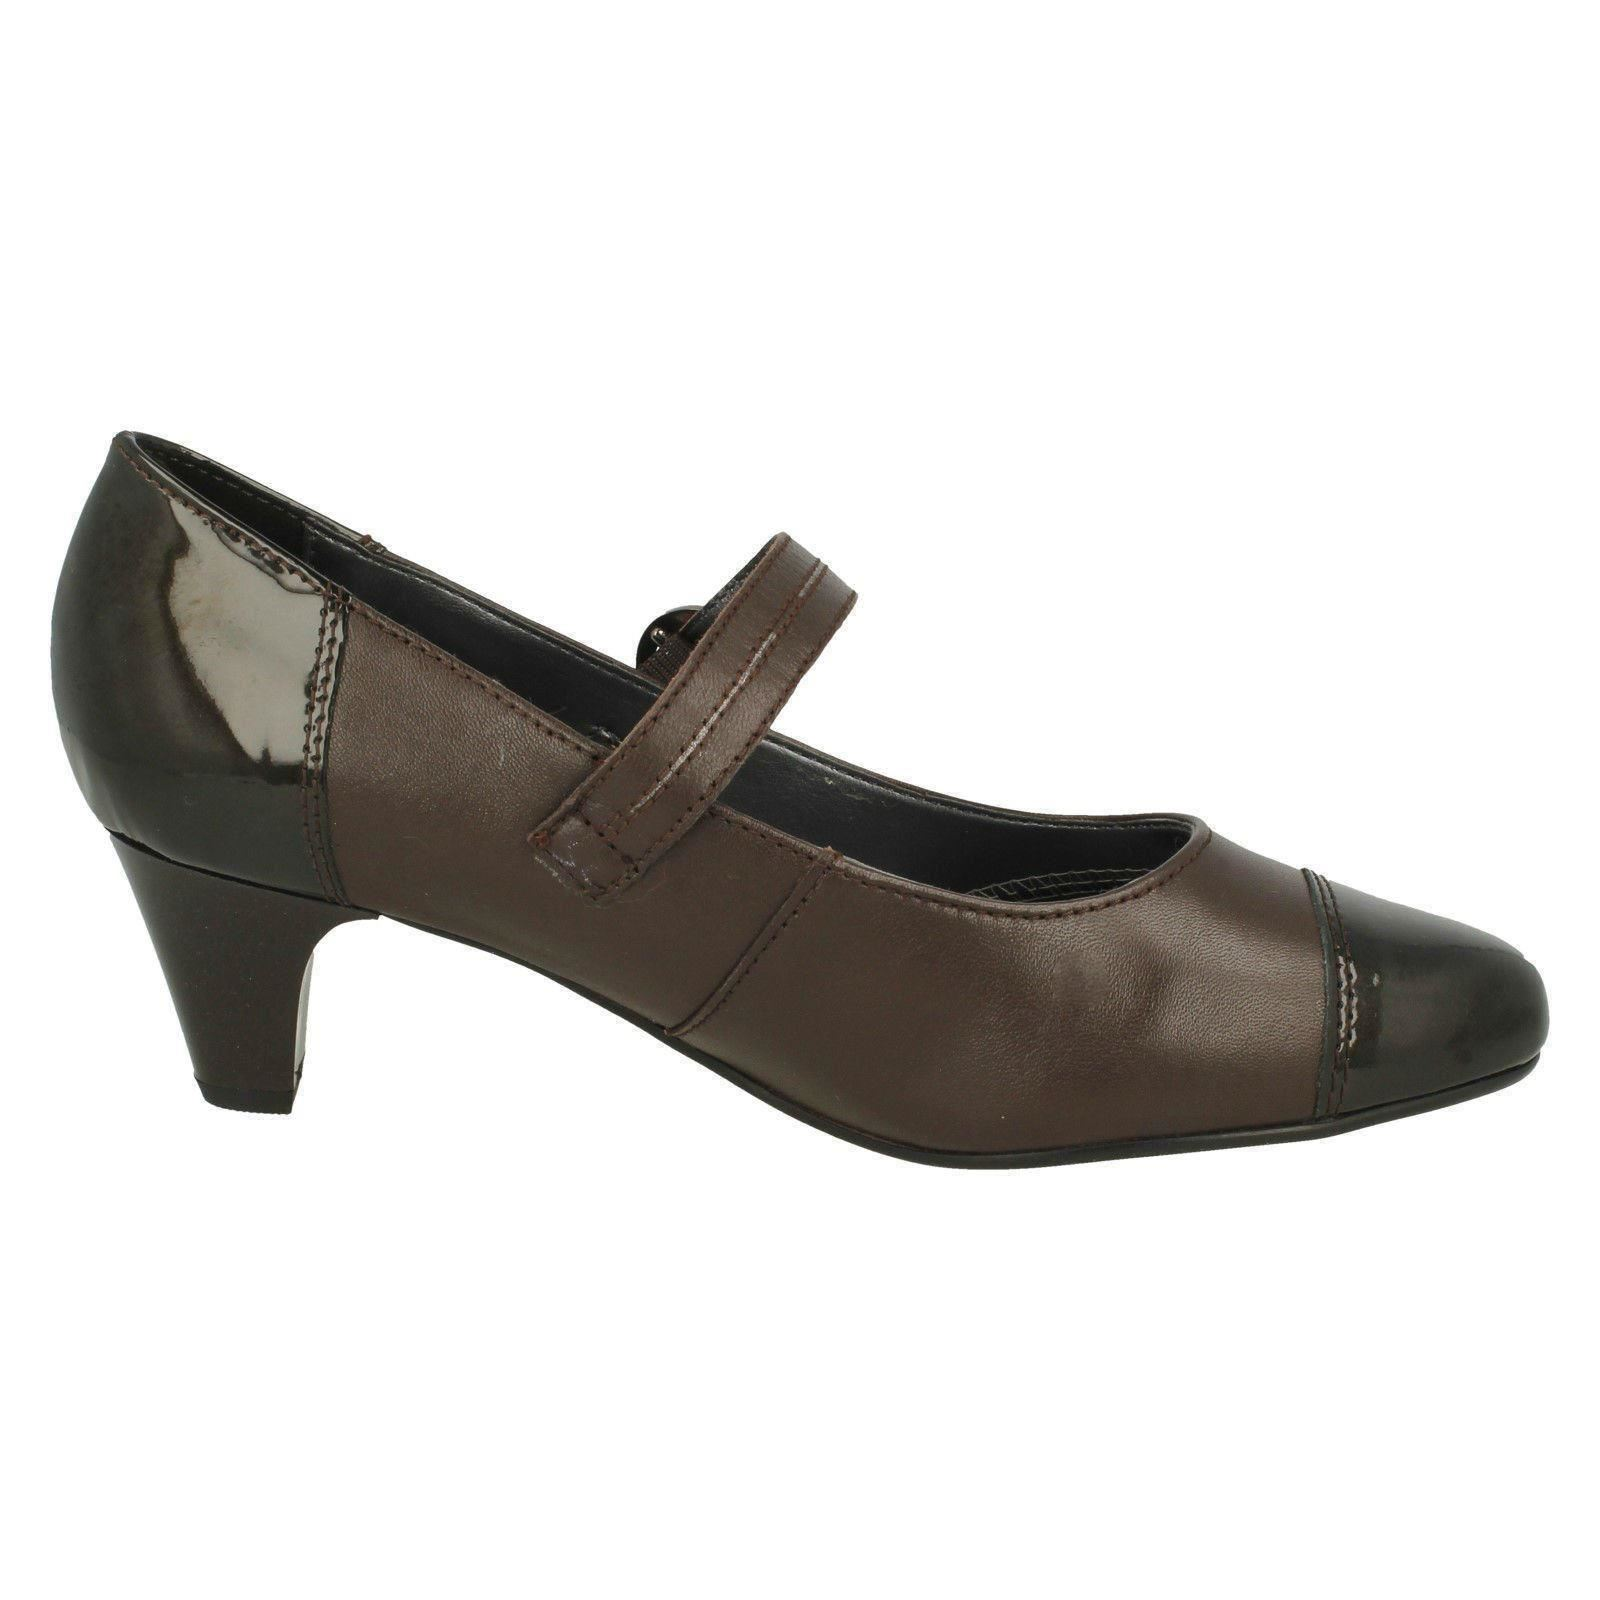 Brown Scarpe stile con Padded tacco Ladies Jean Mary Jane n7U7Hr8x4w